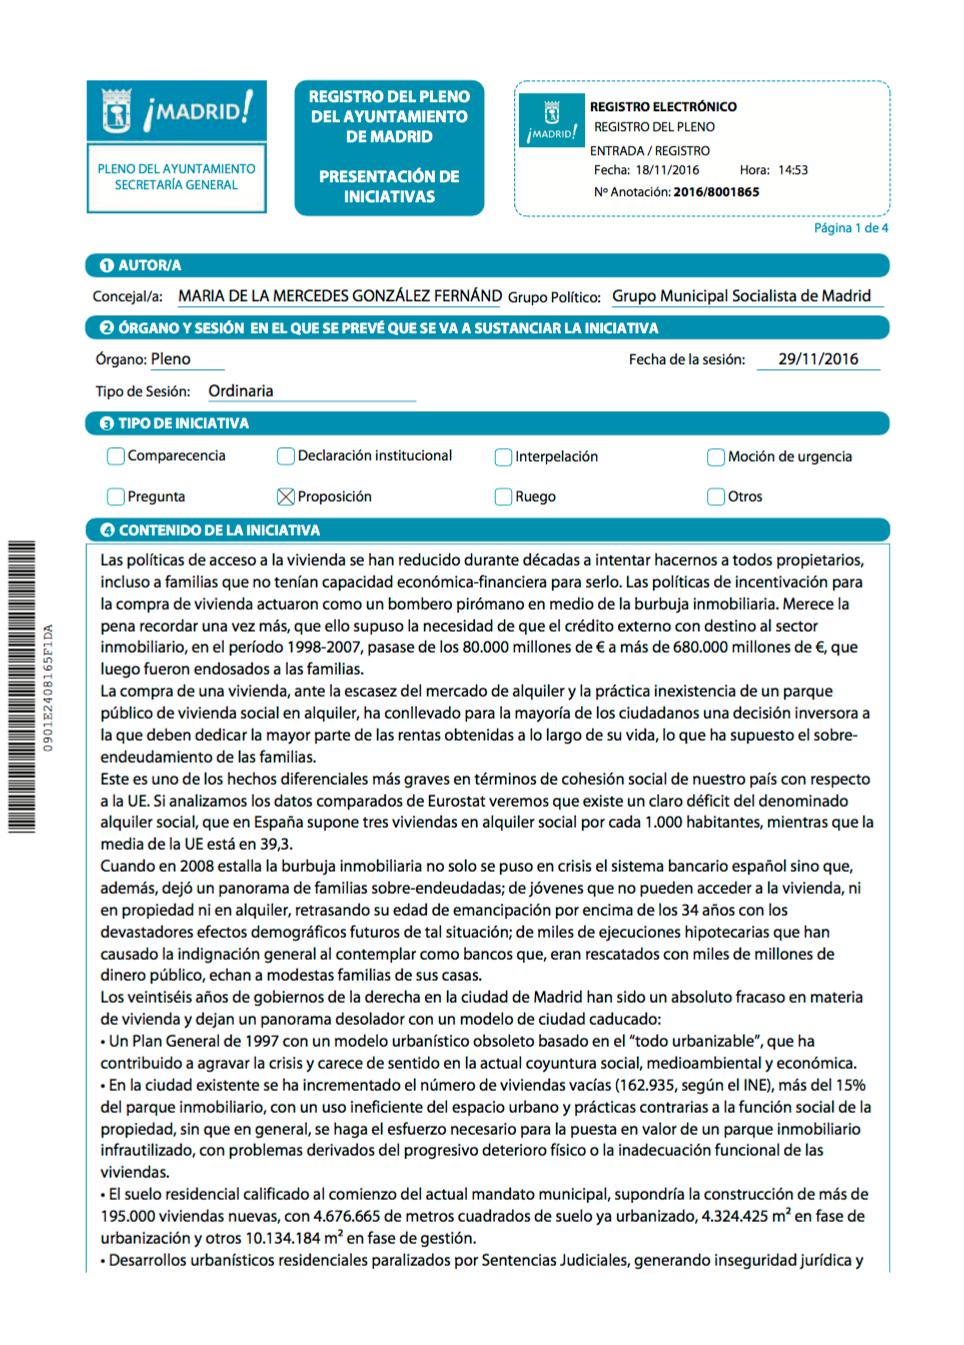 proposicion-vivienda-carmena-colau.png